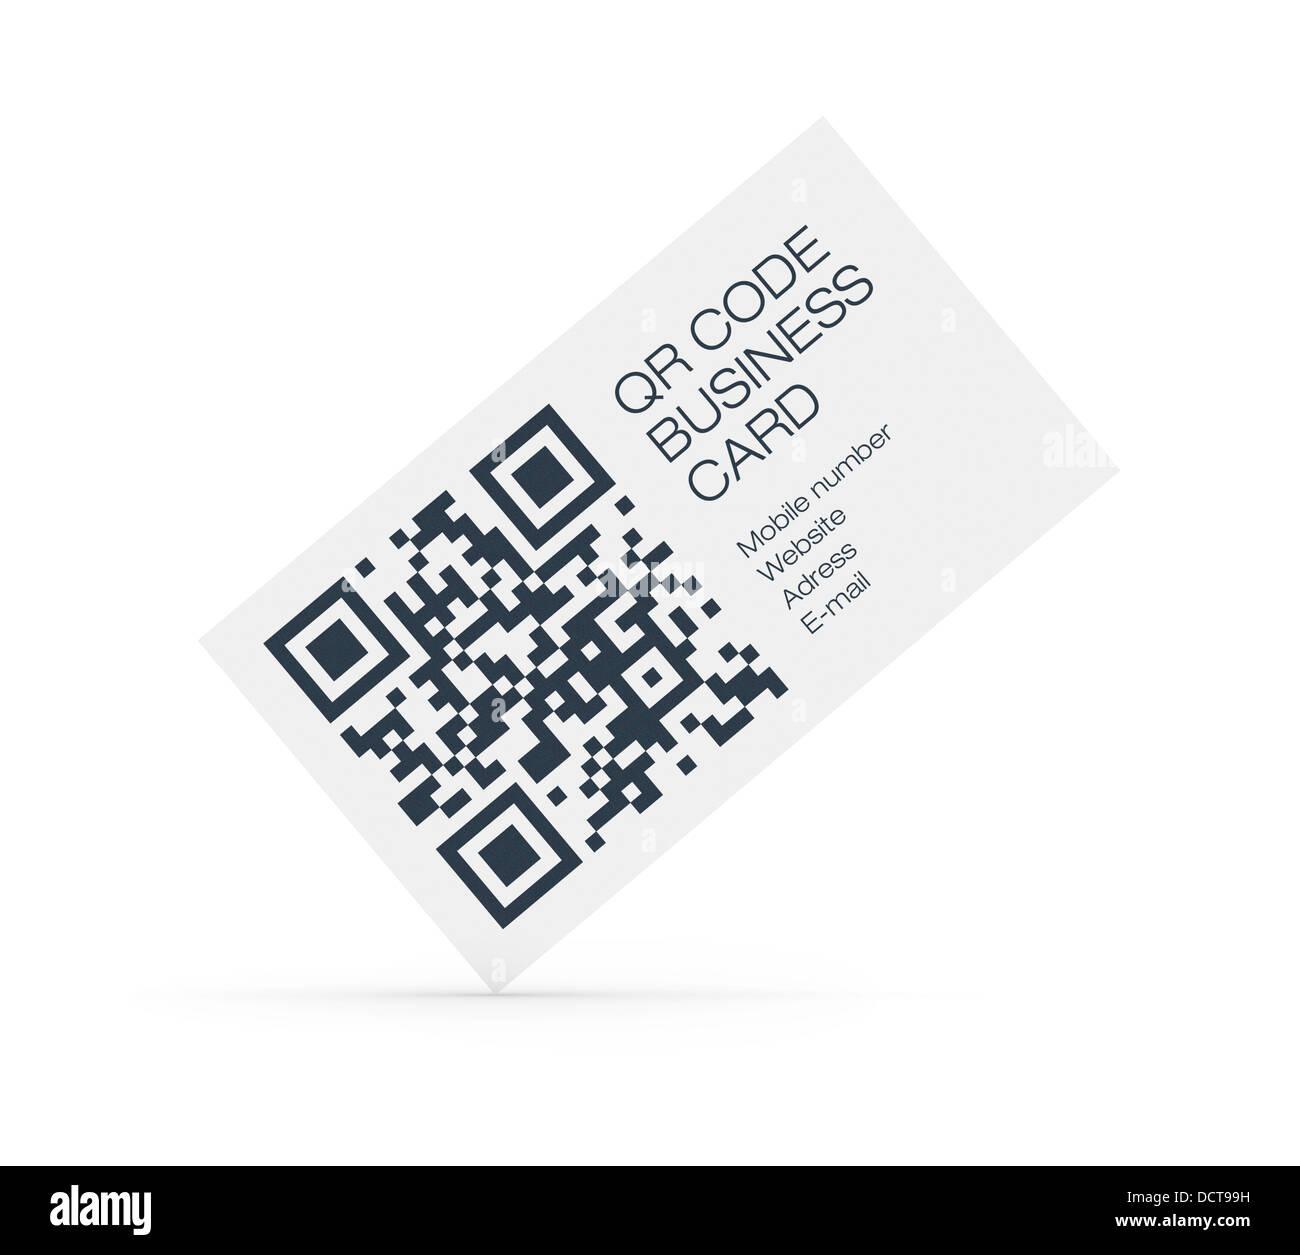 Qr Code Visitenkarten Konzept Stockfoto Bild 59541149 Alamy